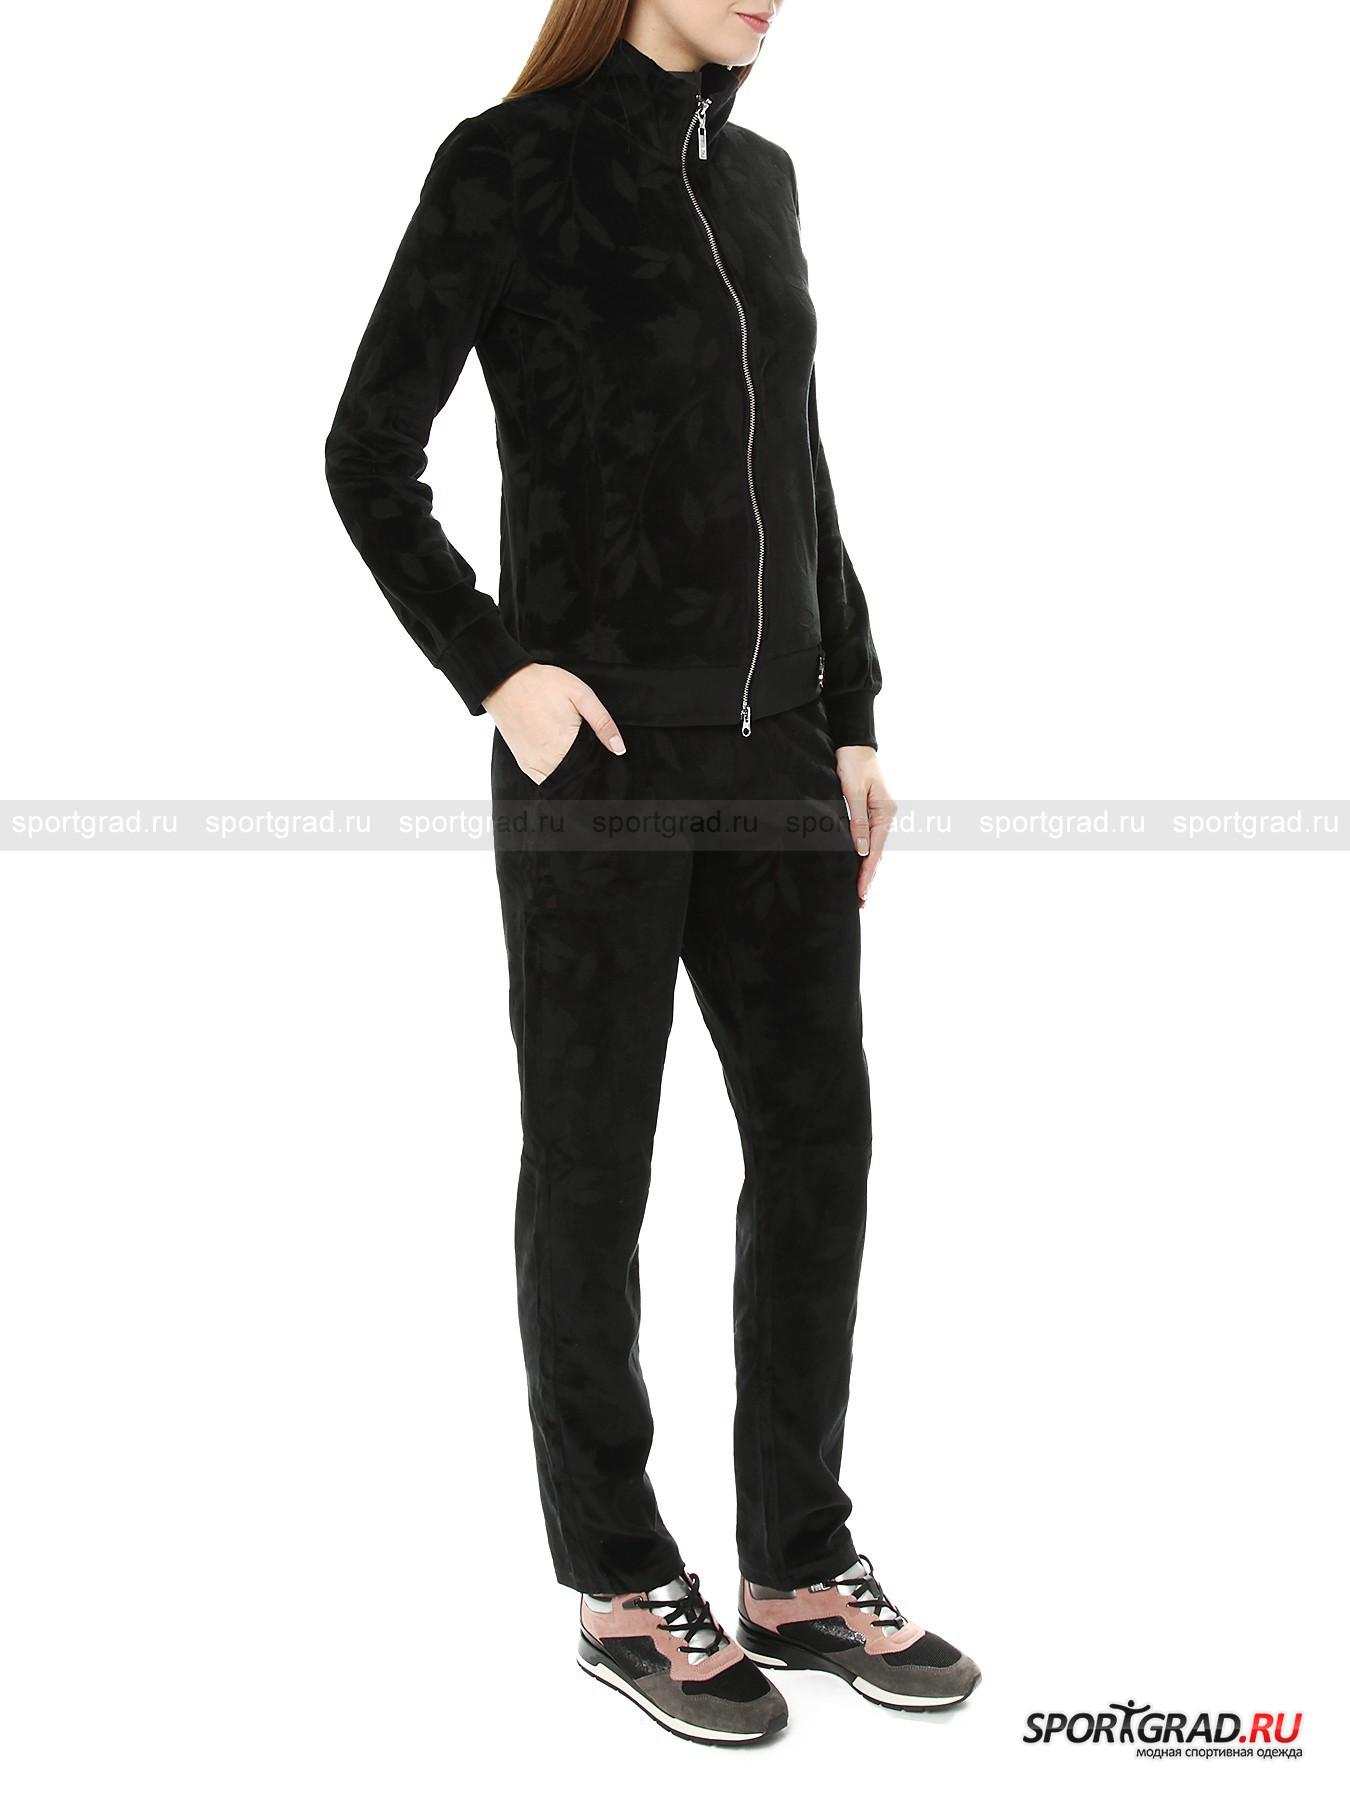 Armani женский костюм